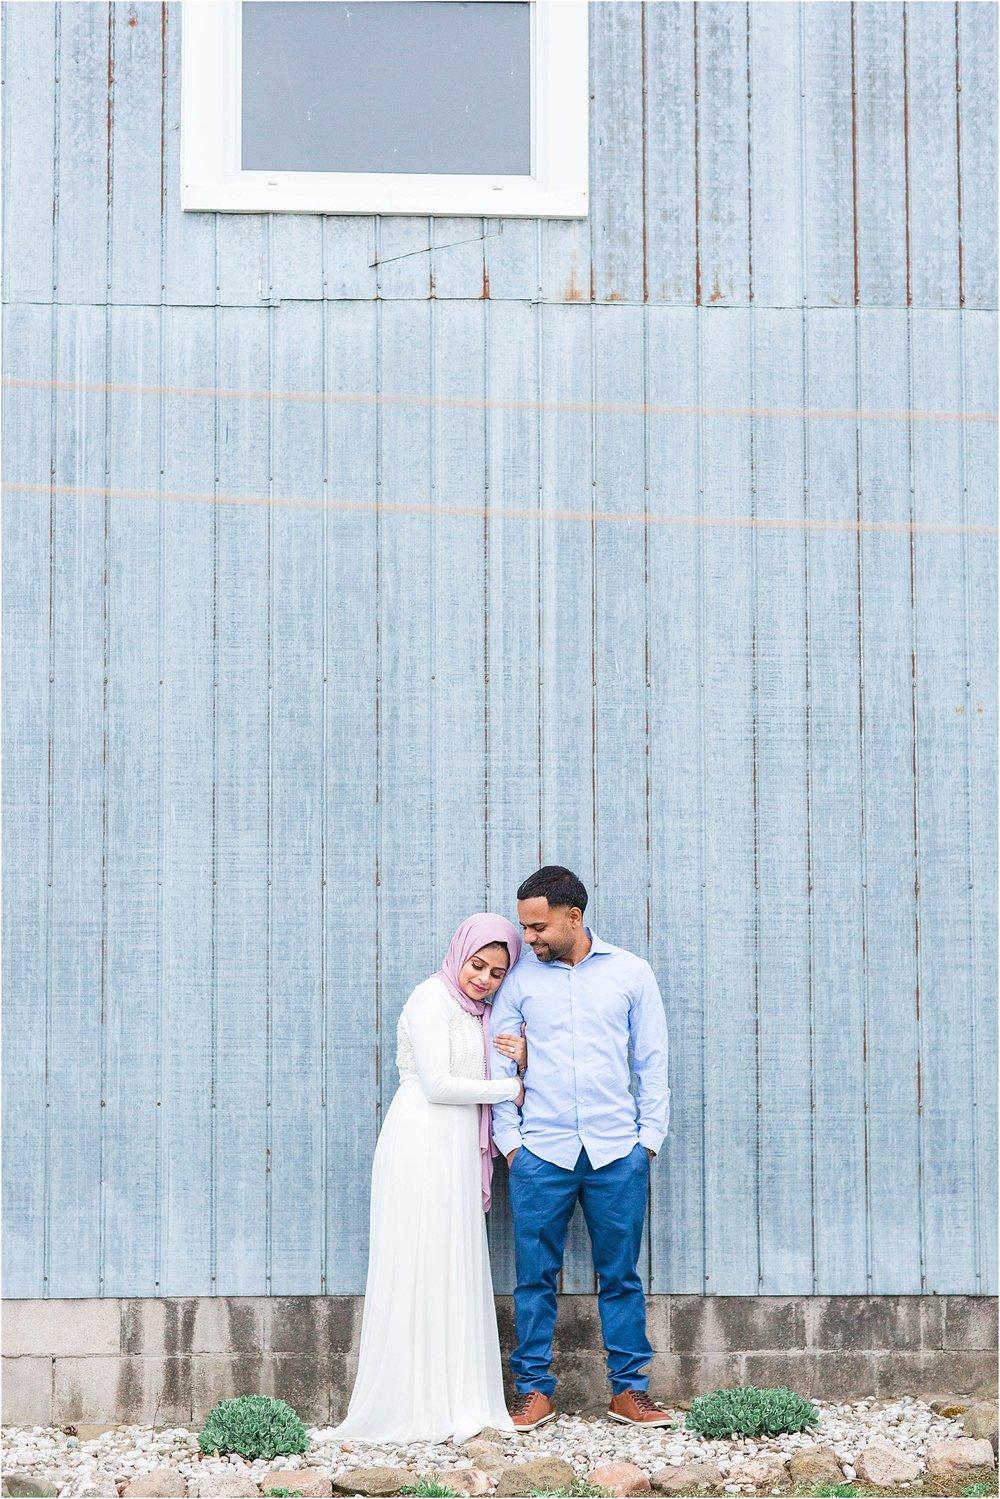 Niagara-on-the-lake-cherry-blossom-farm-Engagement-Session-Toronto-Mississauga-Brampton-Scarborough-GTA-Pakistani-Indian-Wedding-Engagement-Photographer-Photography_0041.jpg